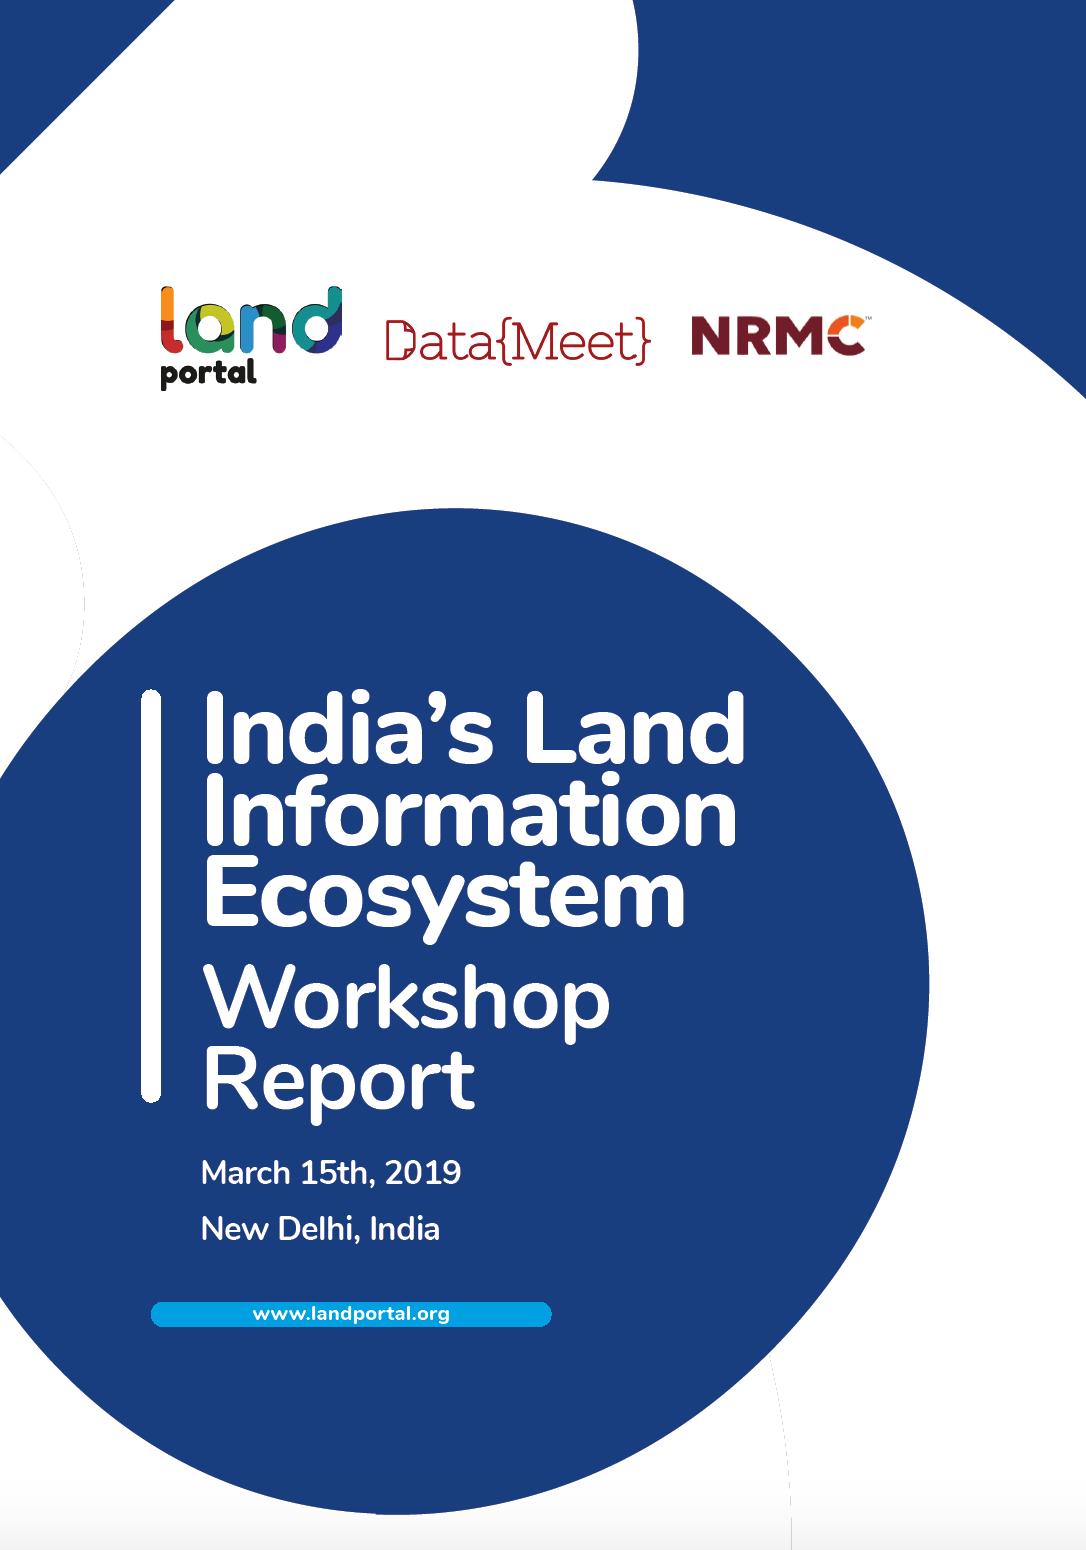 India's Land Information Ecosystem workshop report cover image